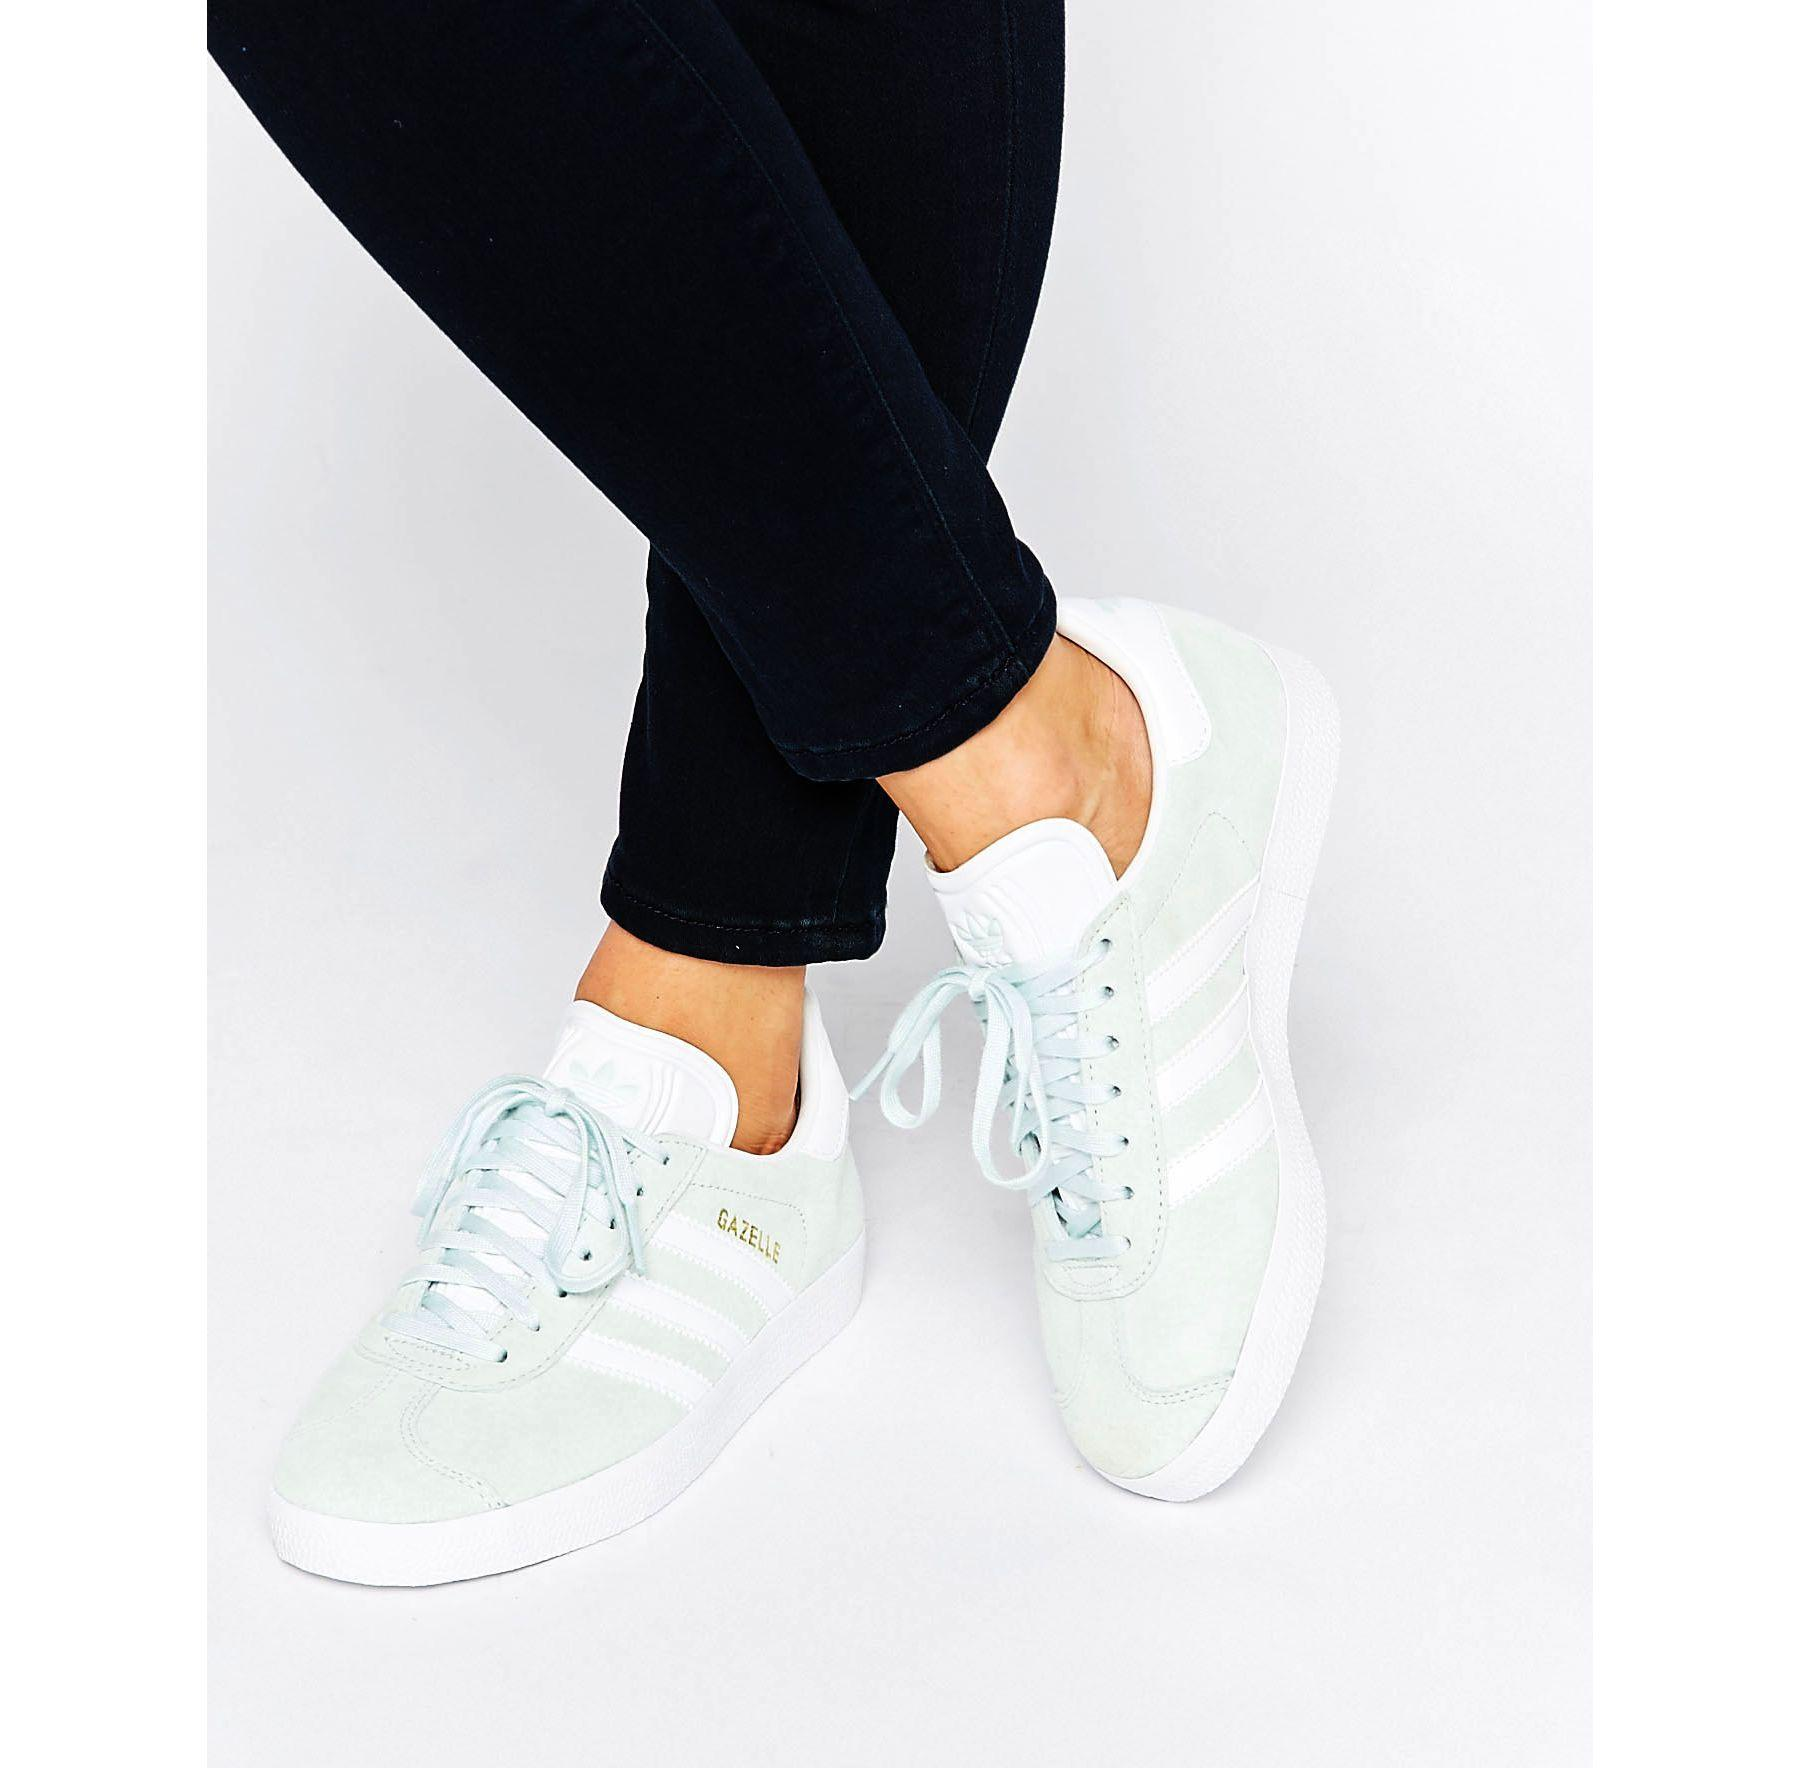 Adidas Gazelle Originals White Flower Shoes Sale Australia